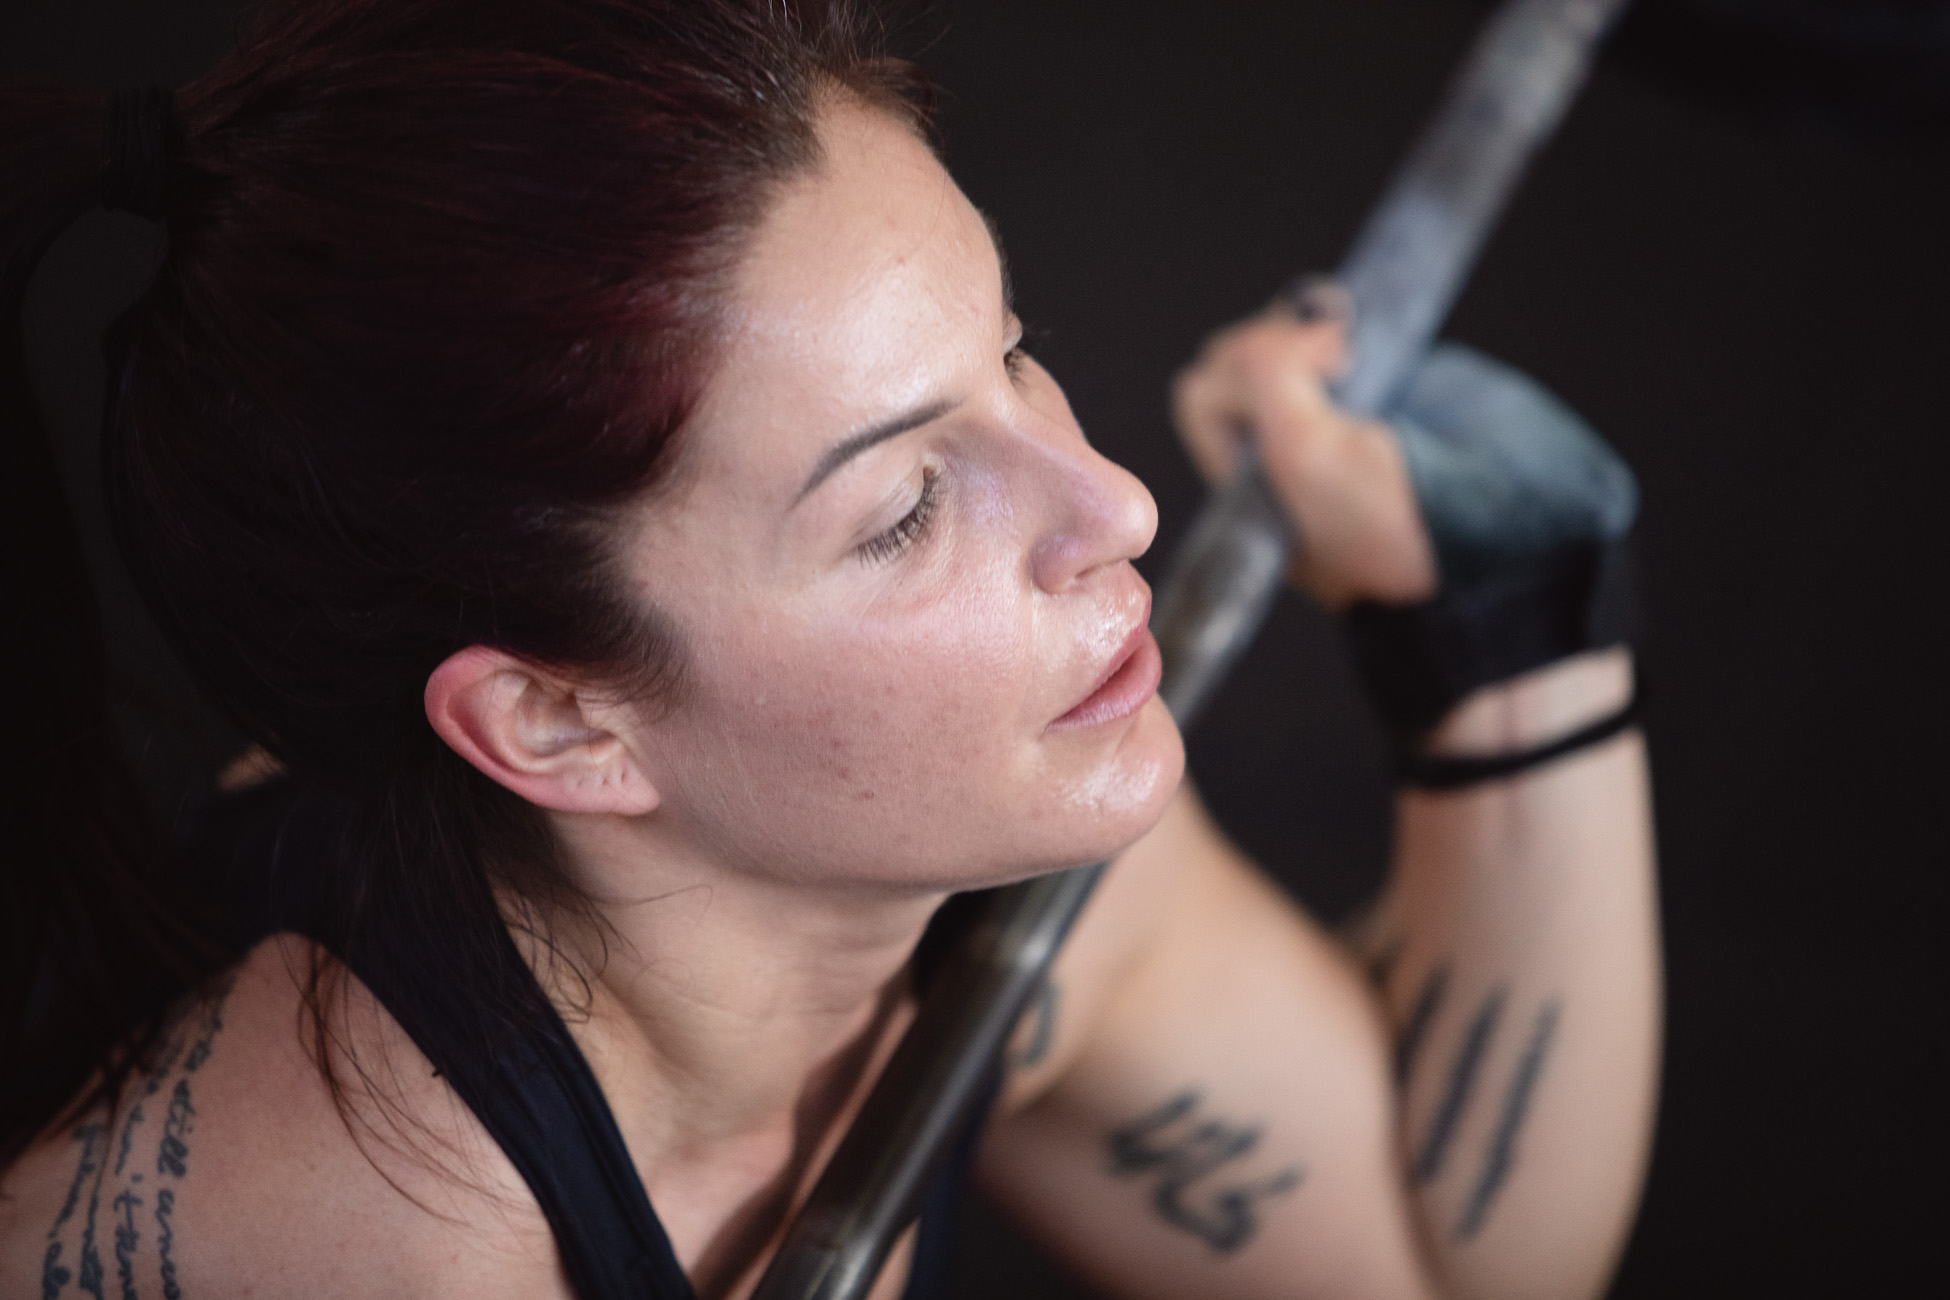 crossfit-games-open-fitness-lifestyle-desporto-atleta-fotografia-008.jpg